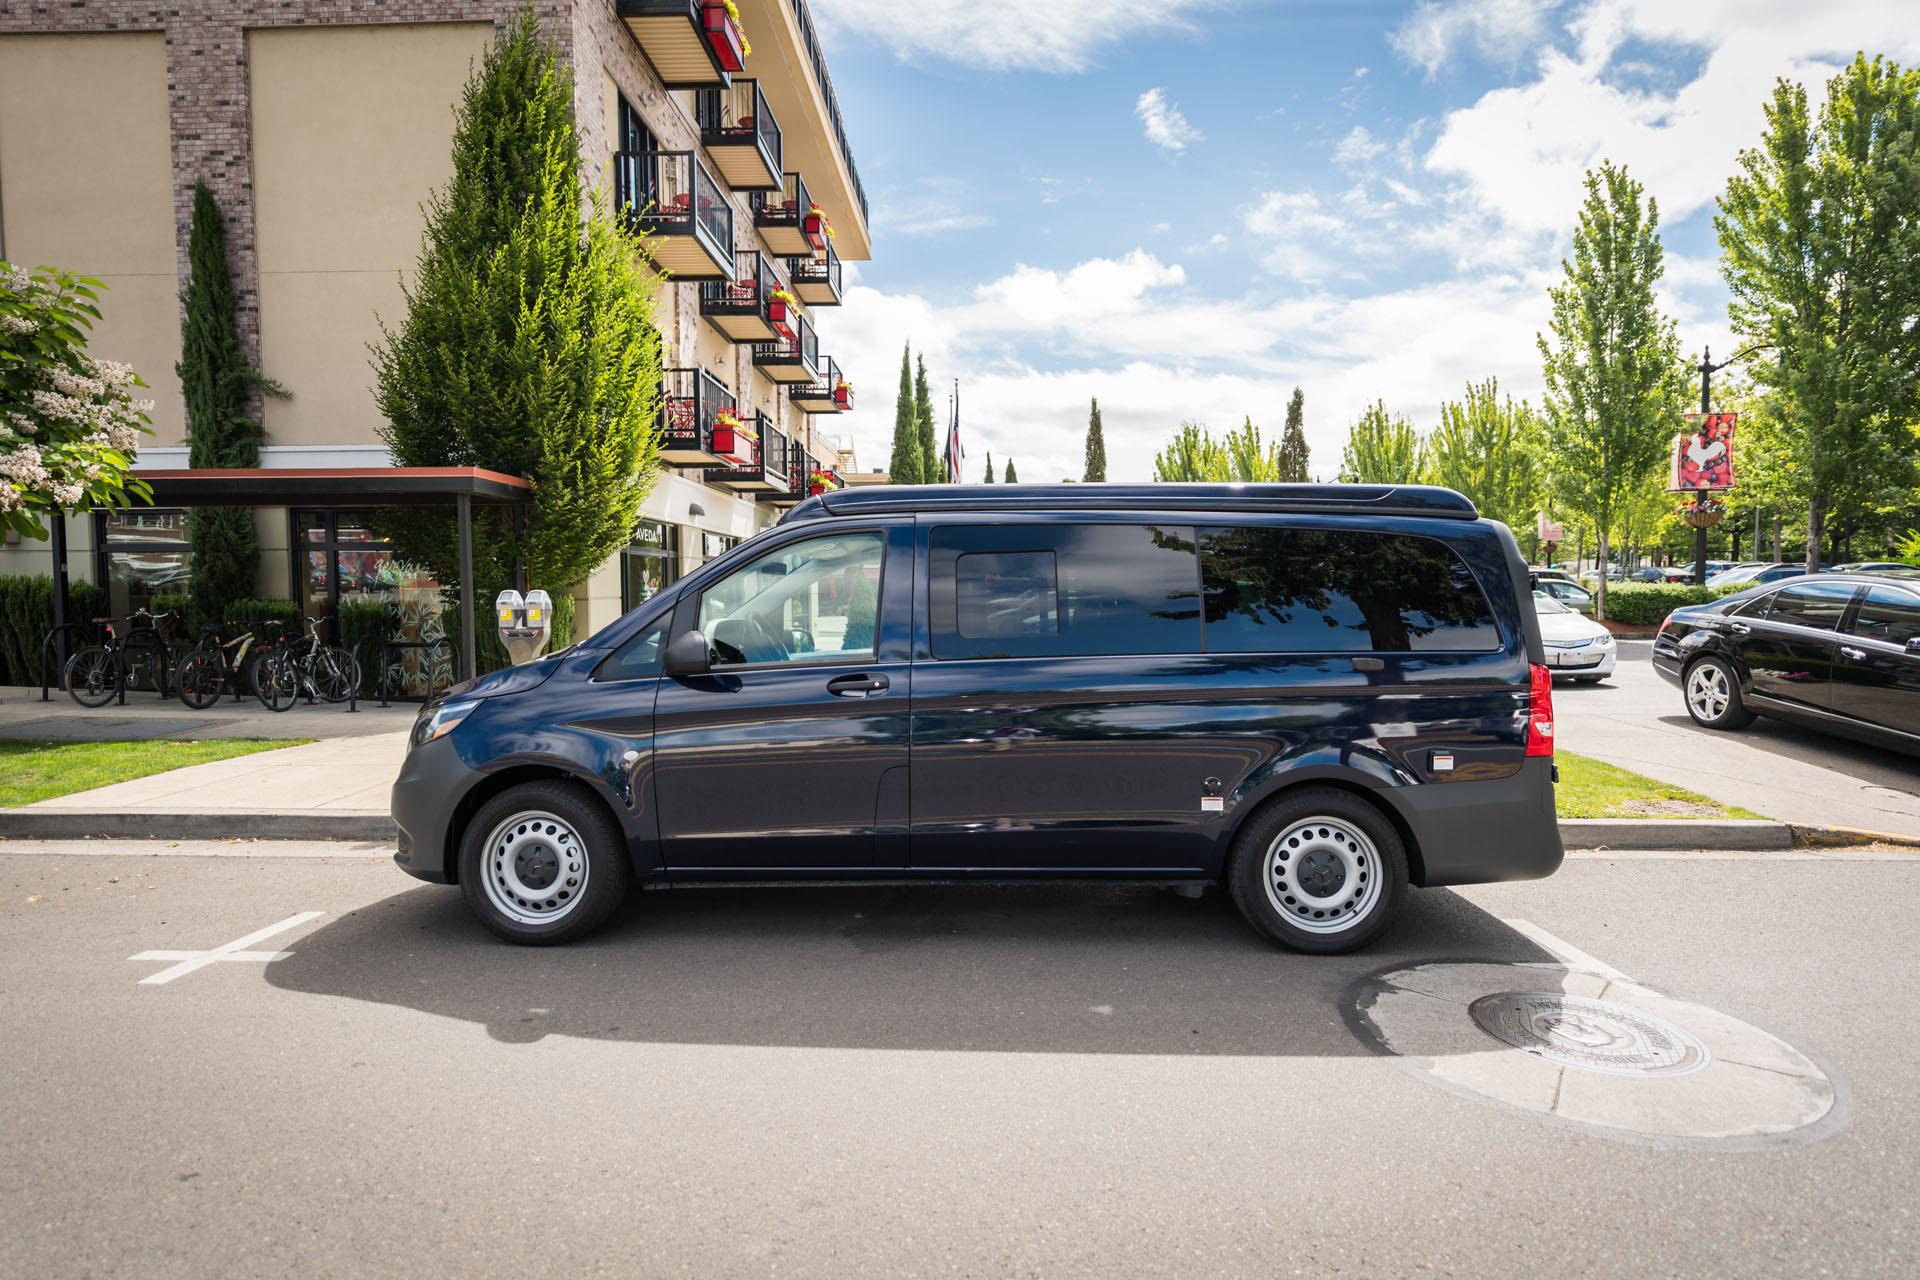 Mercedes Benz Camper Van Oregon | Keystone Coach Works